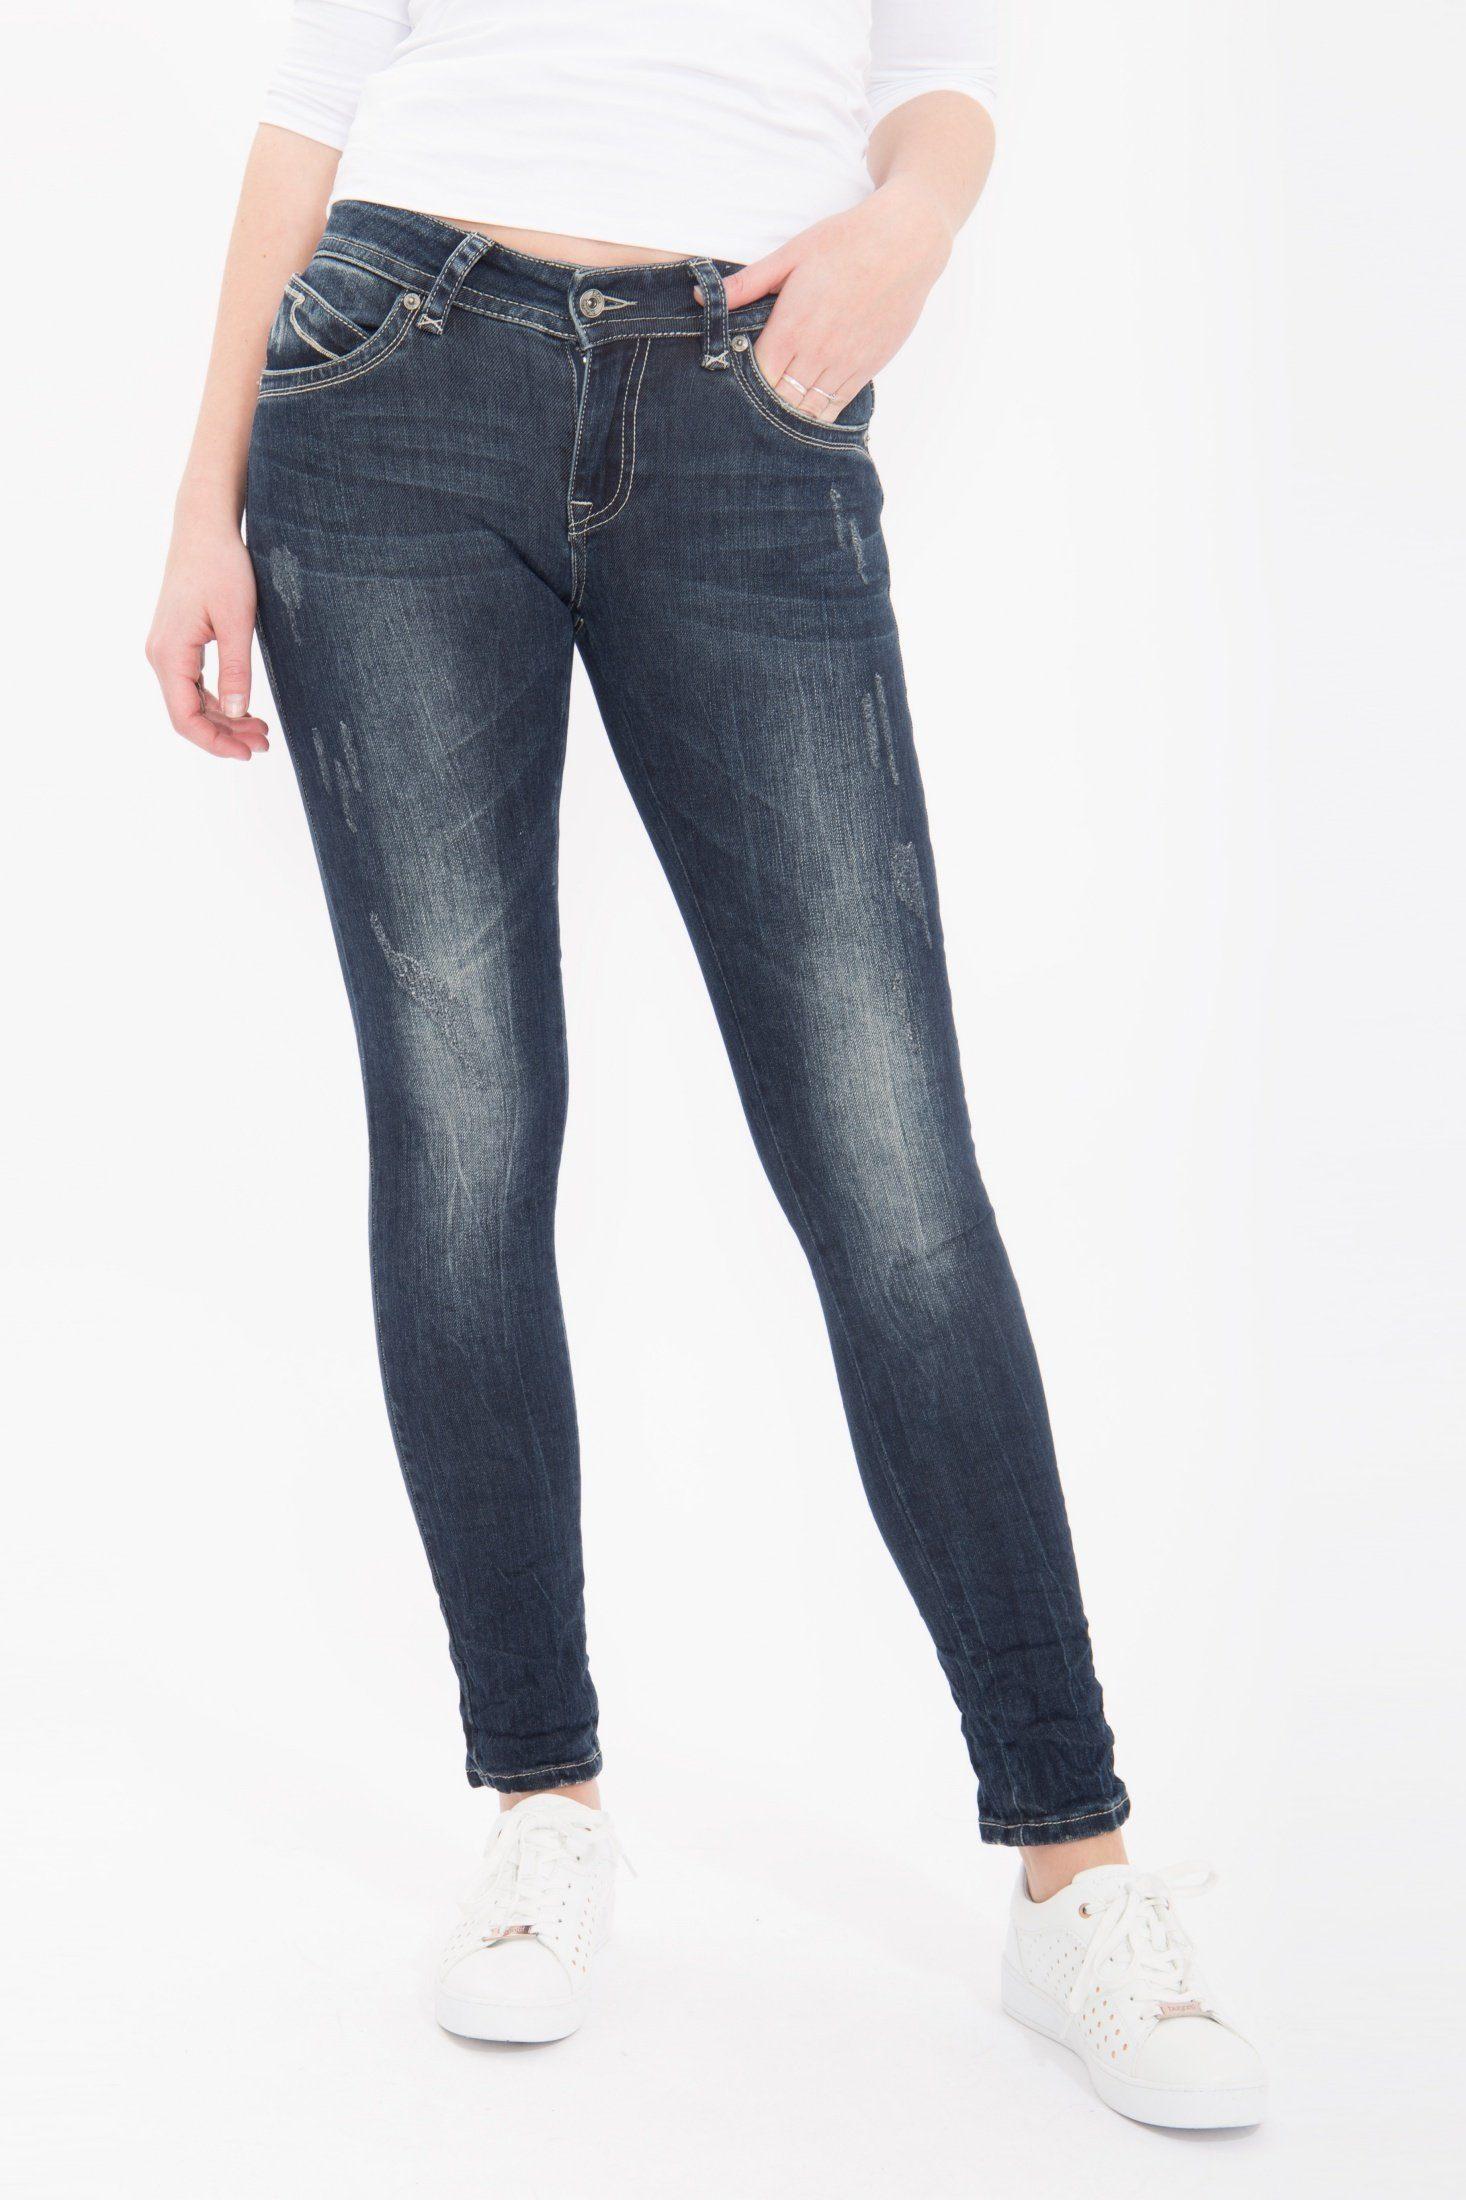 Blue Monkey Skinny-fit-Jeans Laura 1630 | Bekleidung > Jeans > Sonstige Jeans | Blau | Blue Monkey